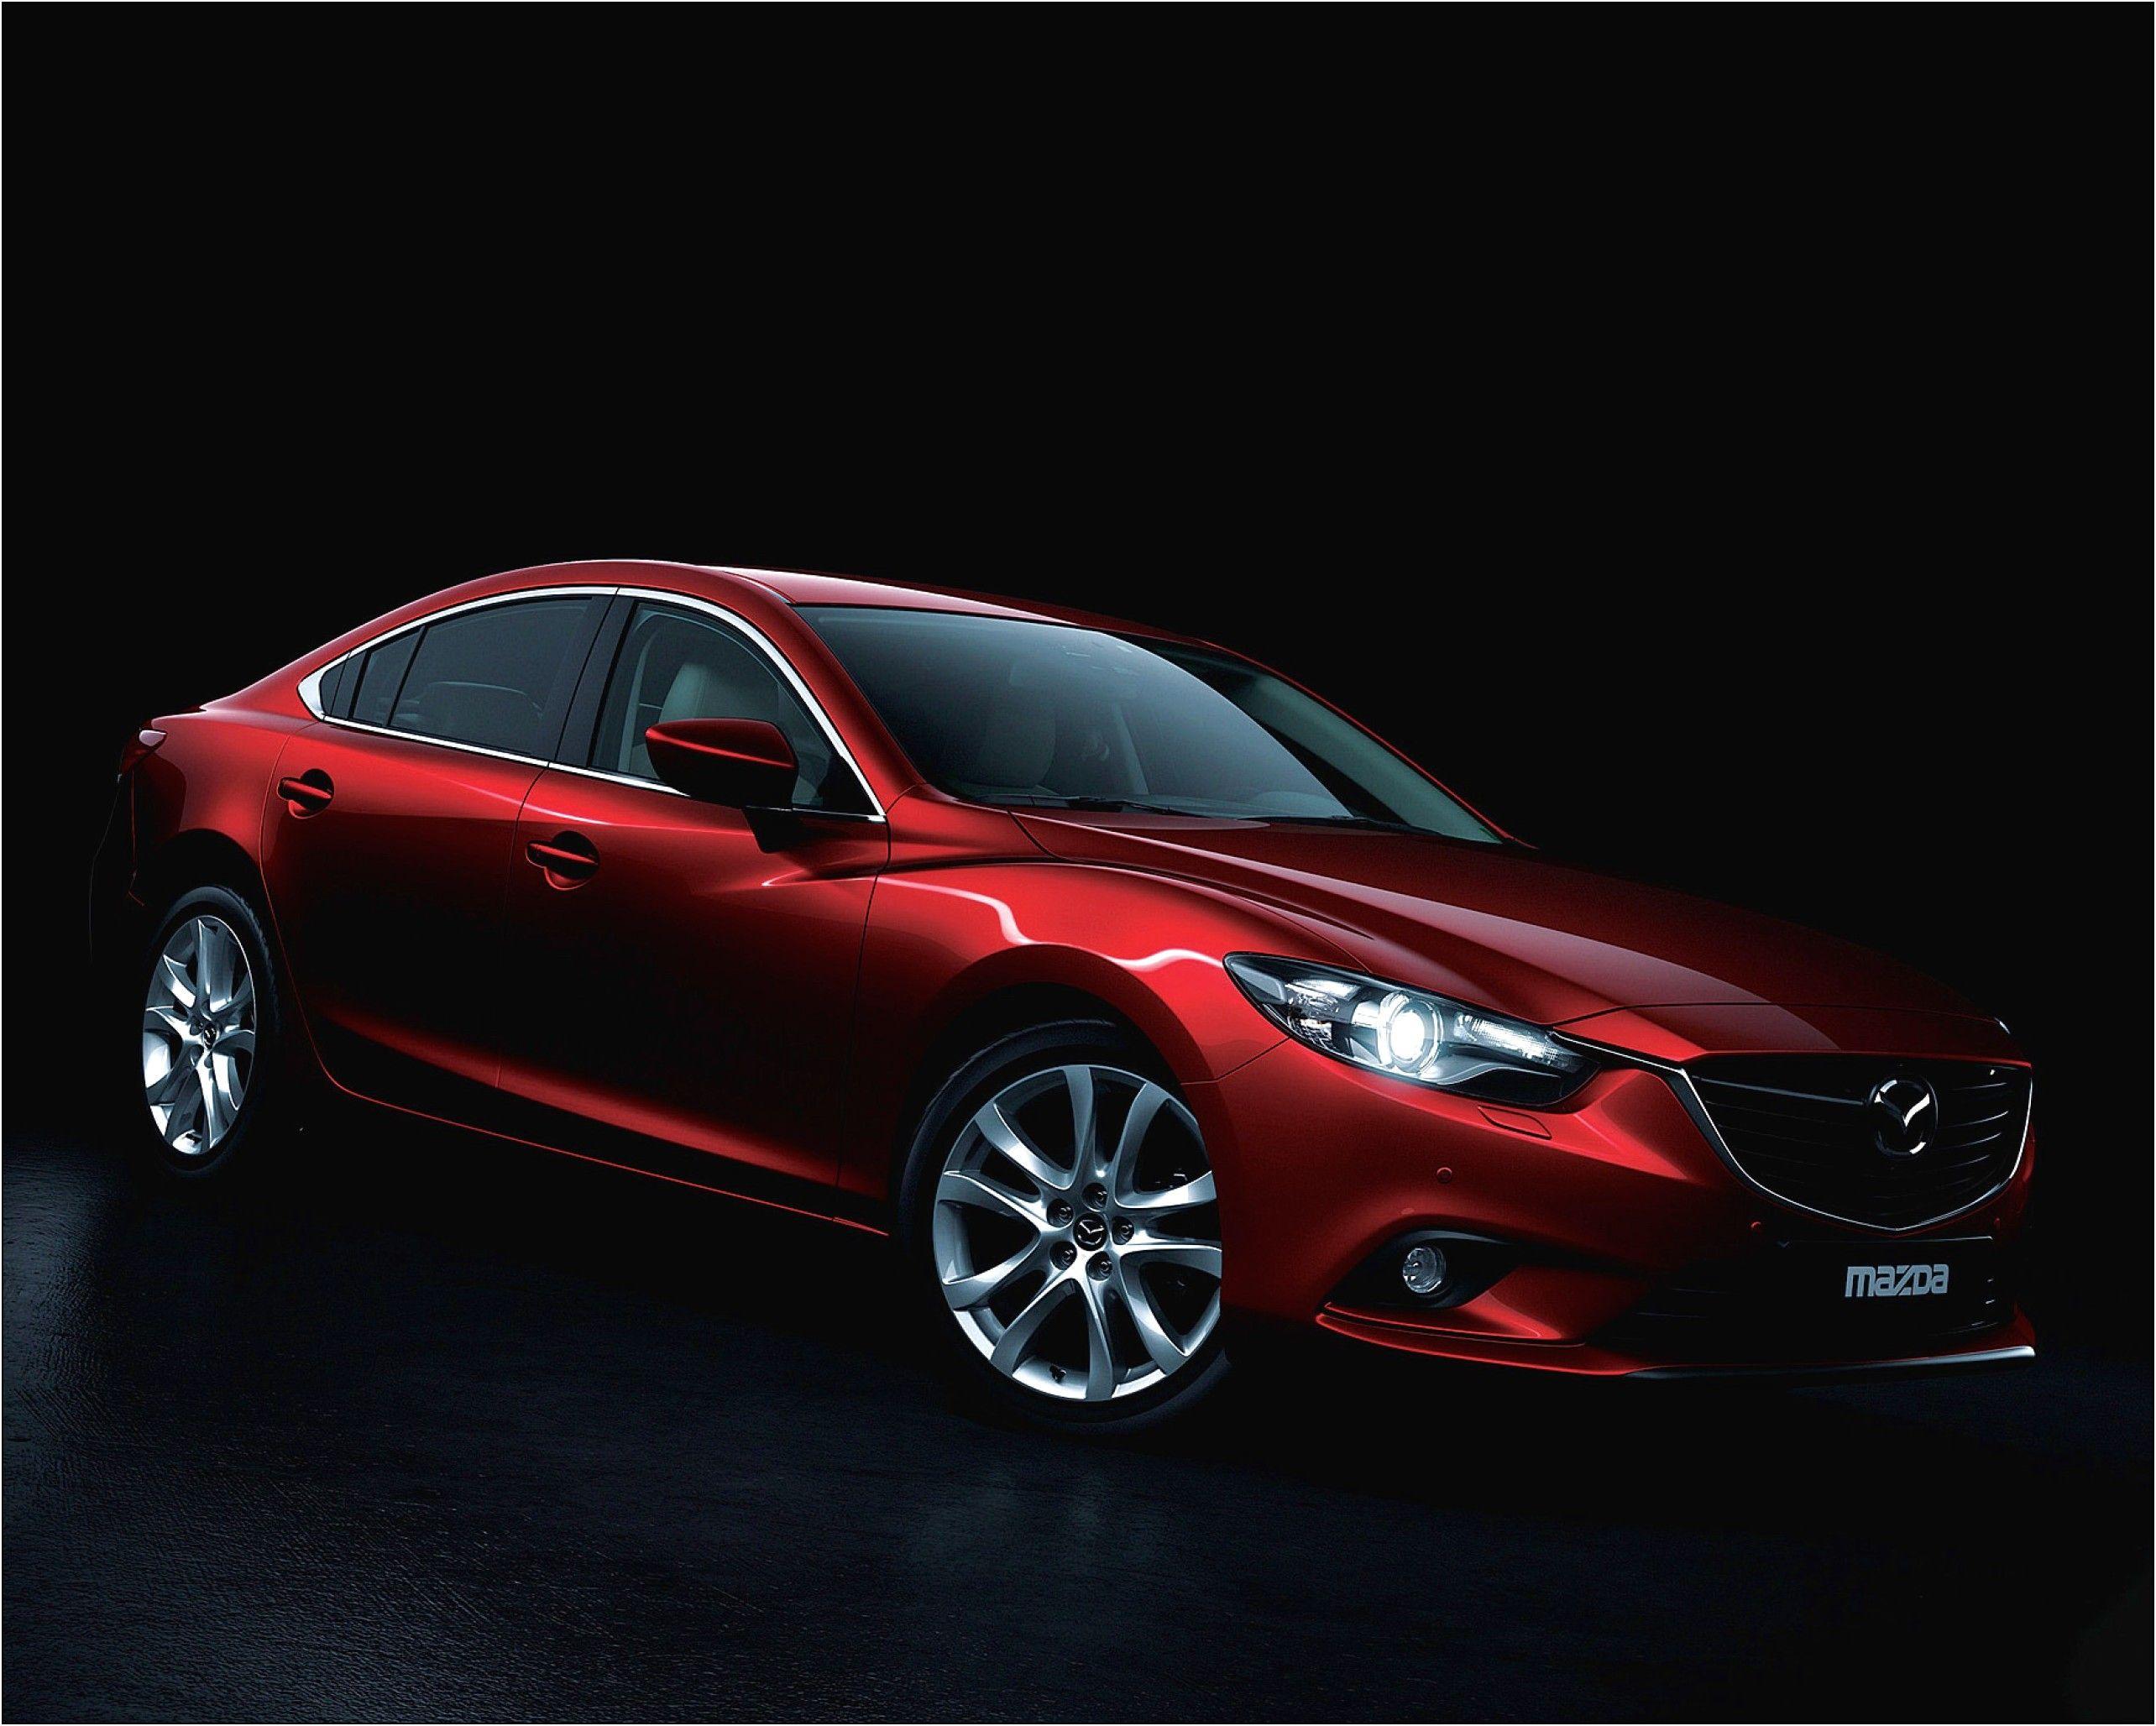 Wallpaper iphone twitter - Mazda 6 Iphone Wallpaper Http Www Justcontinentalcars Com Mazda